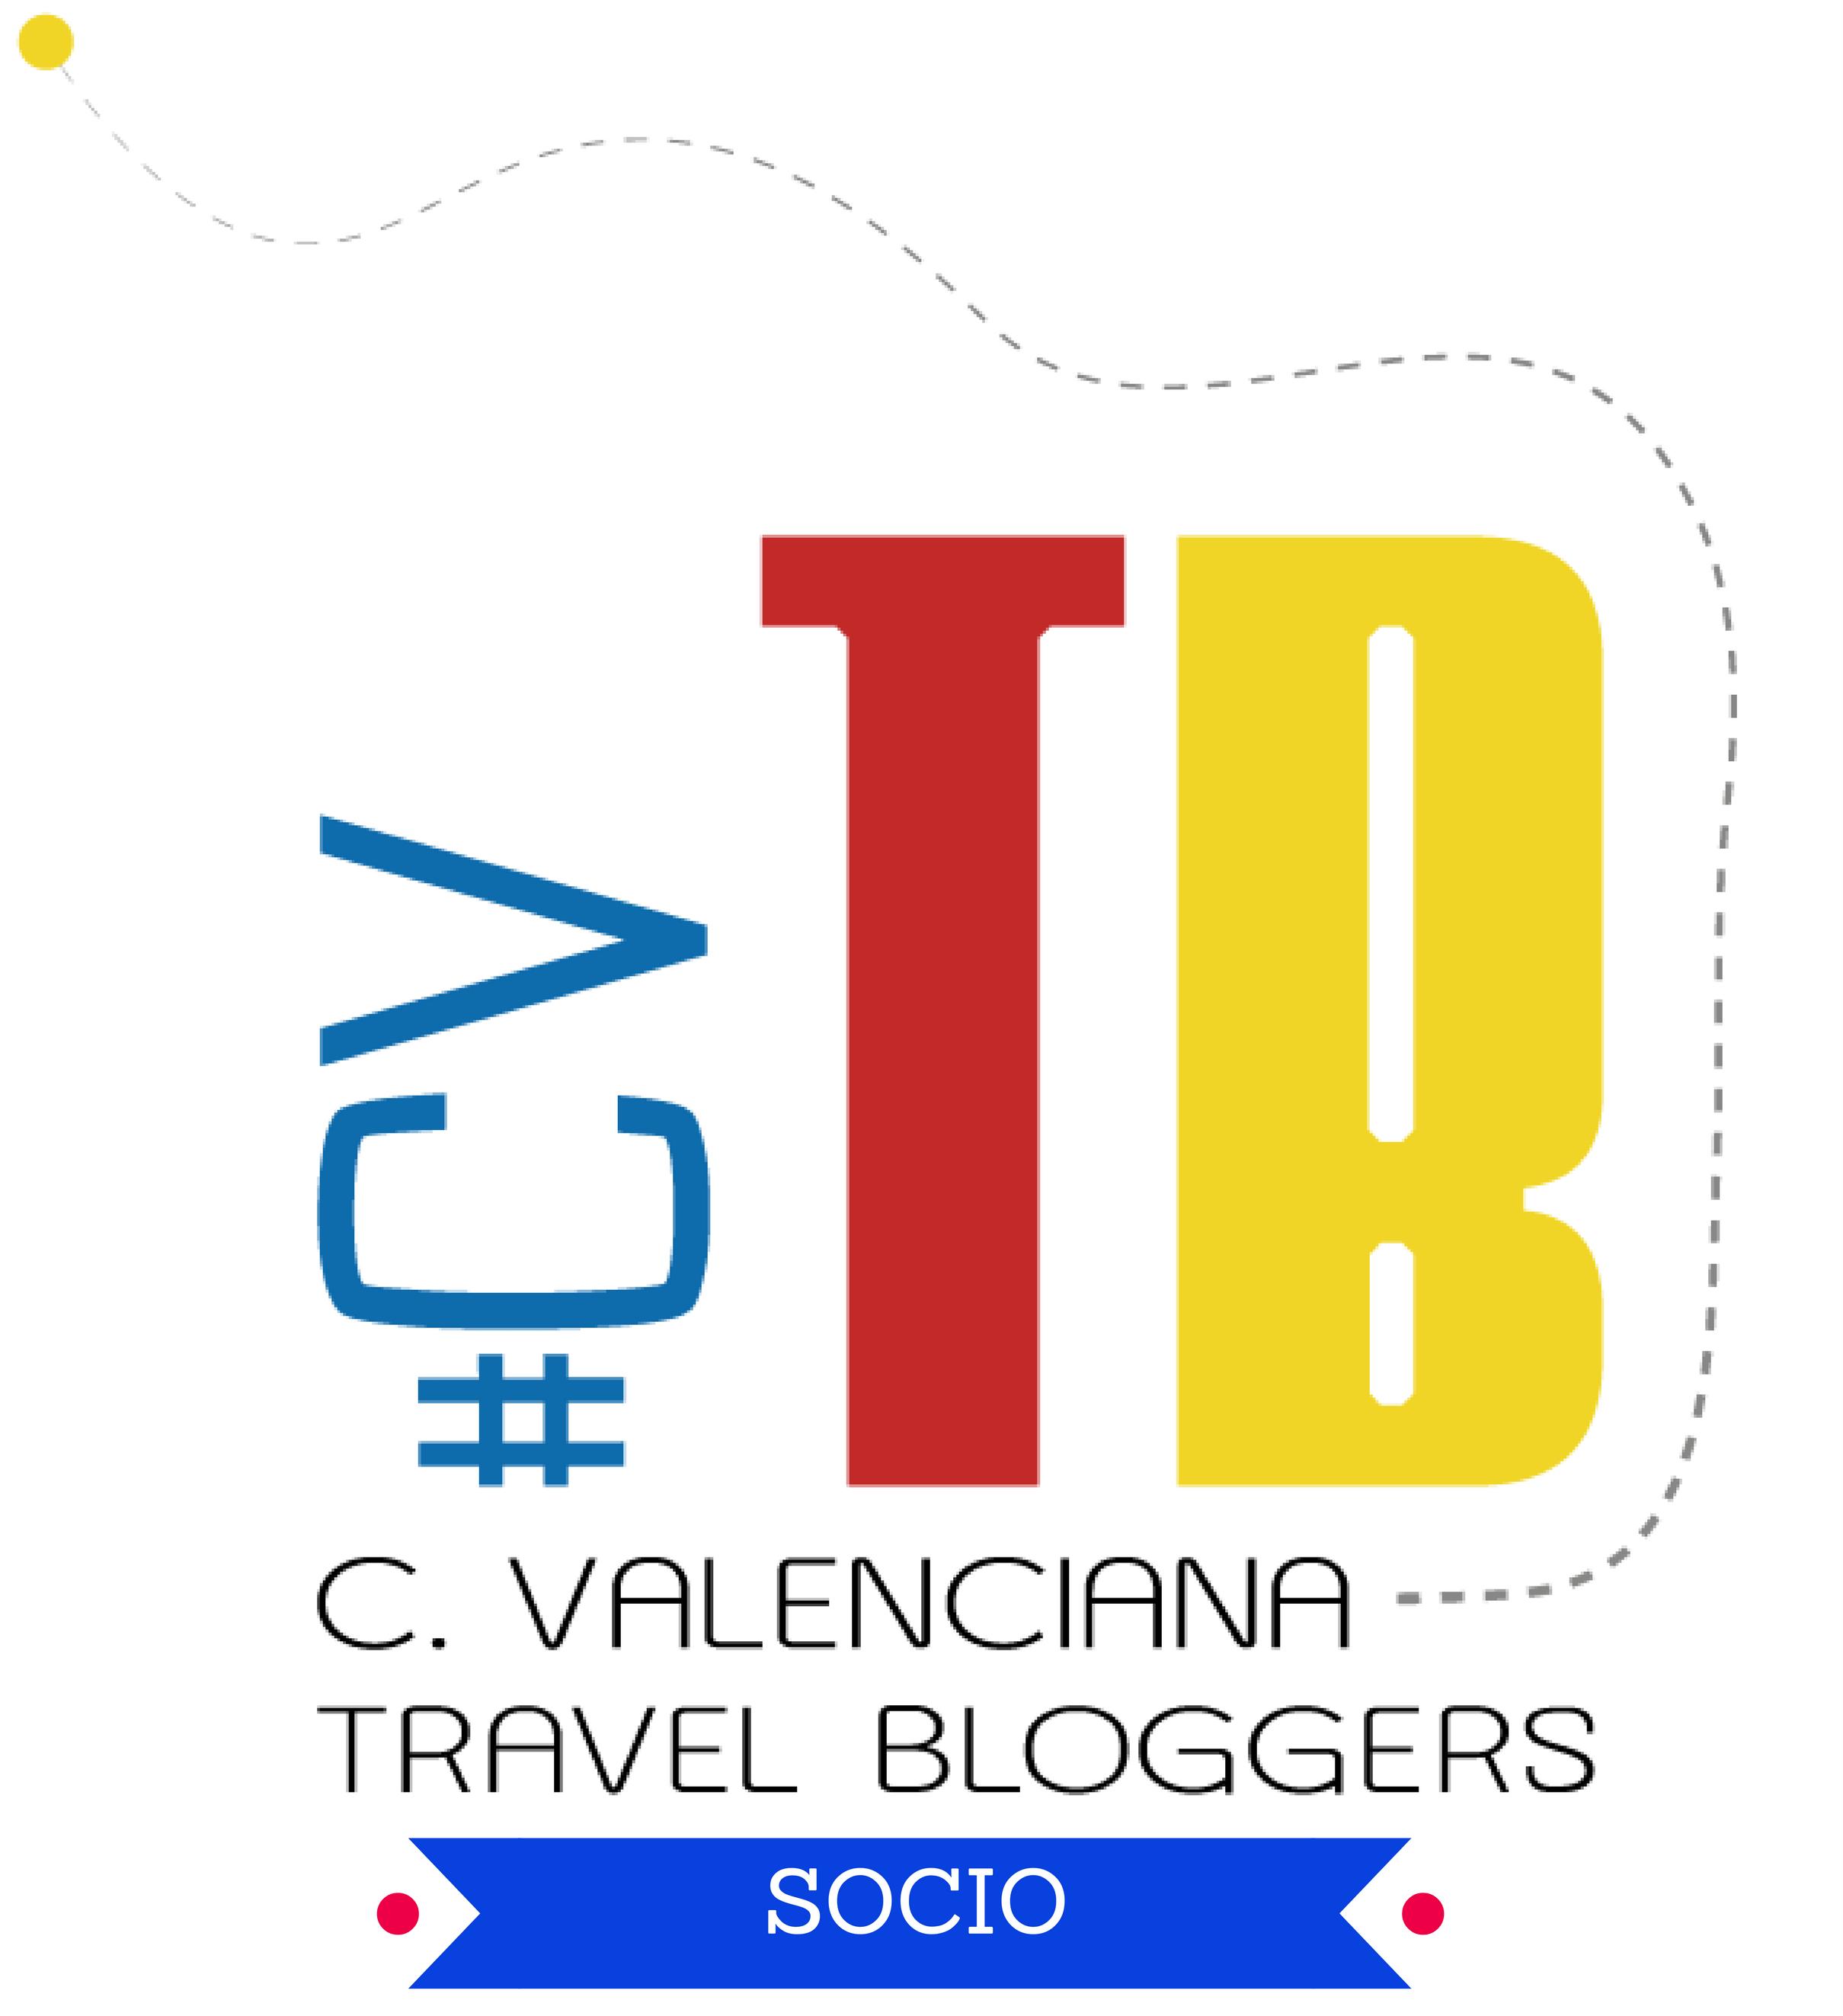 Comunidad Valenciana Travel Bloggers